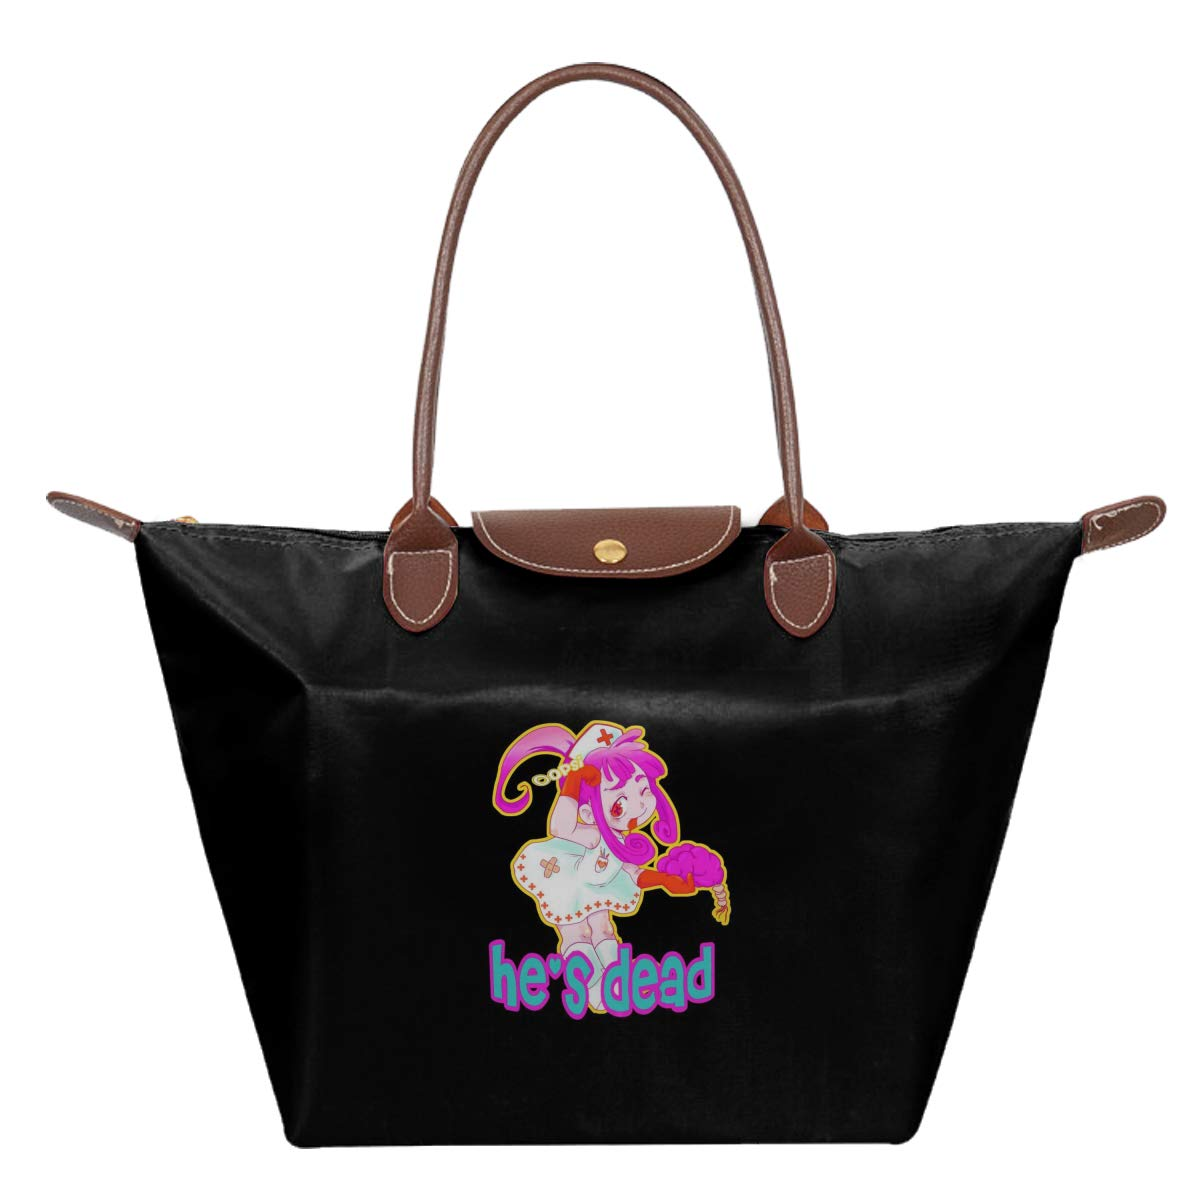 Oopsi HES Dead Kawai Nurse Waterproof Leather Folded Messenger Nylon Bag Travel Tote Hopping Folding School Handbags